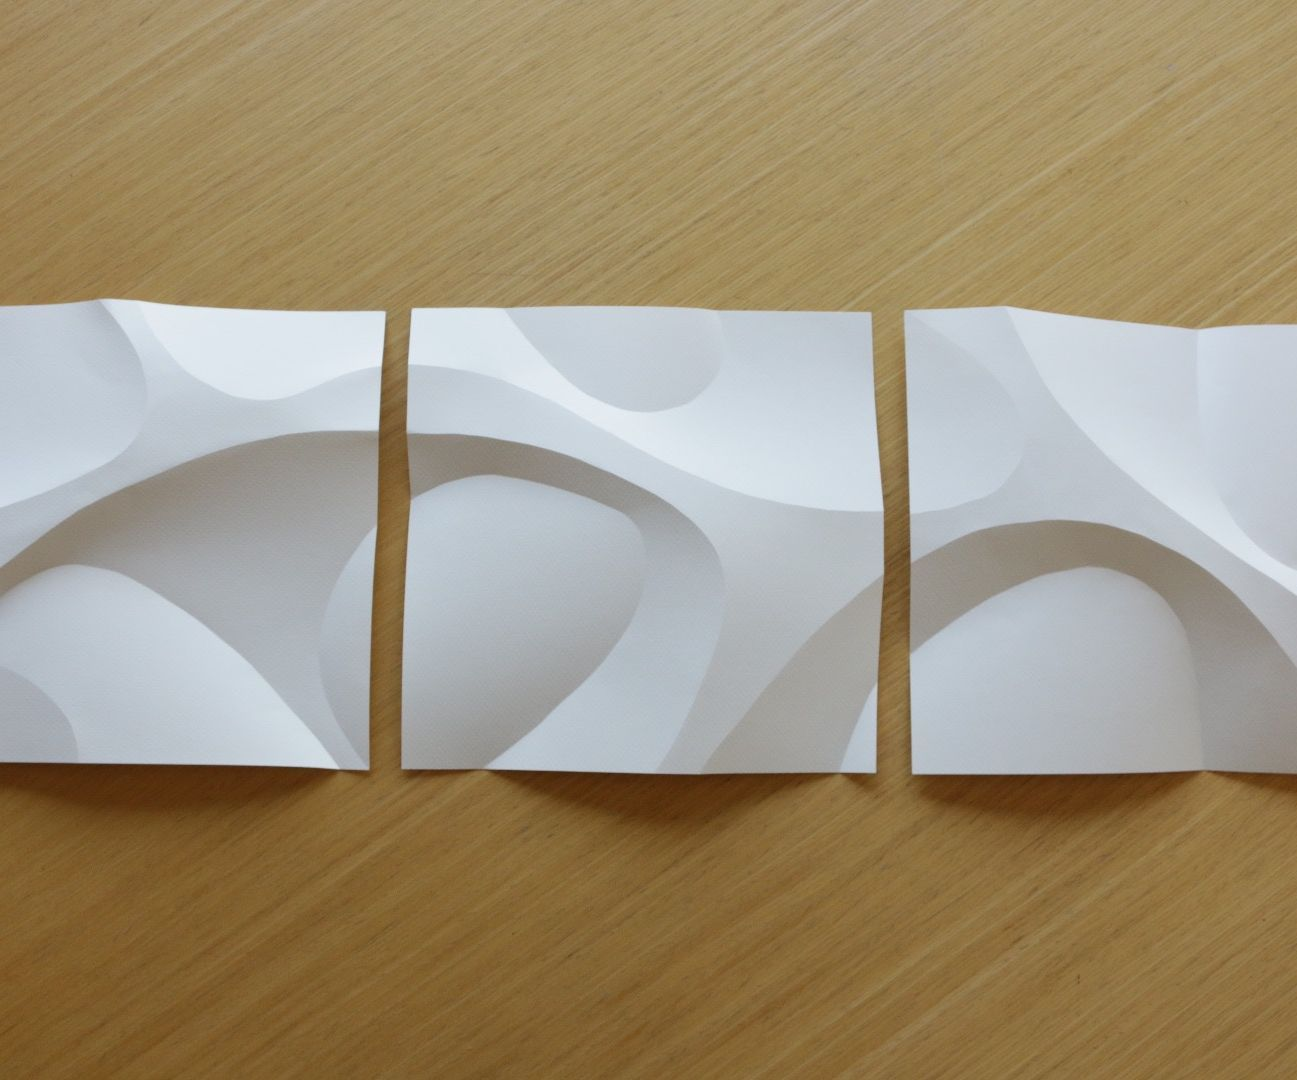 Best 25+ Paper folding art ideas on Pinterest | Origami ... - photo#36